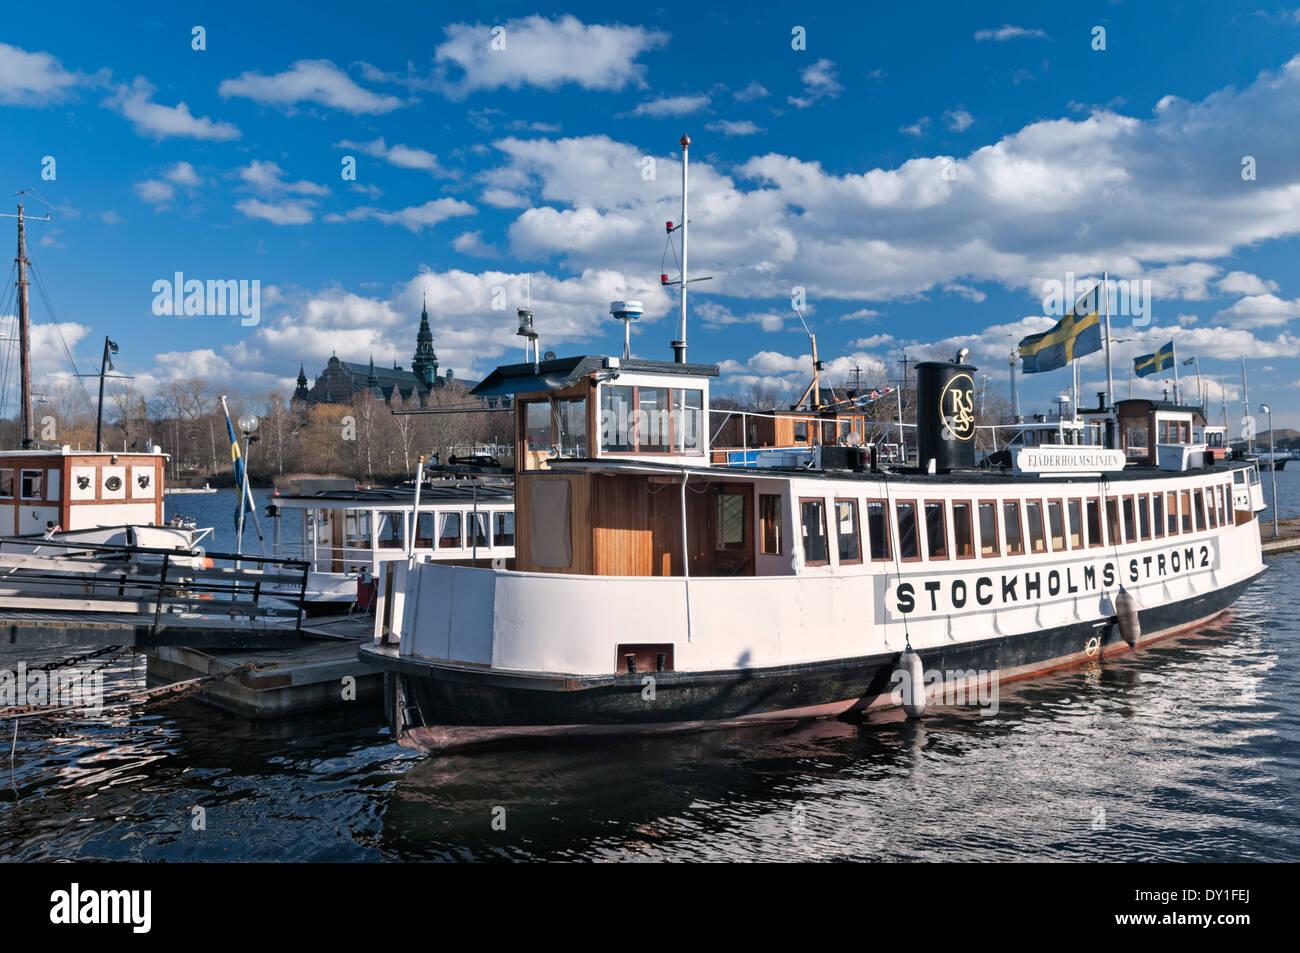 Passenger ferries Östermalm Stockholm Sweden - Stock Image